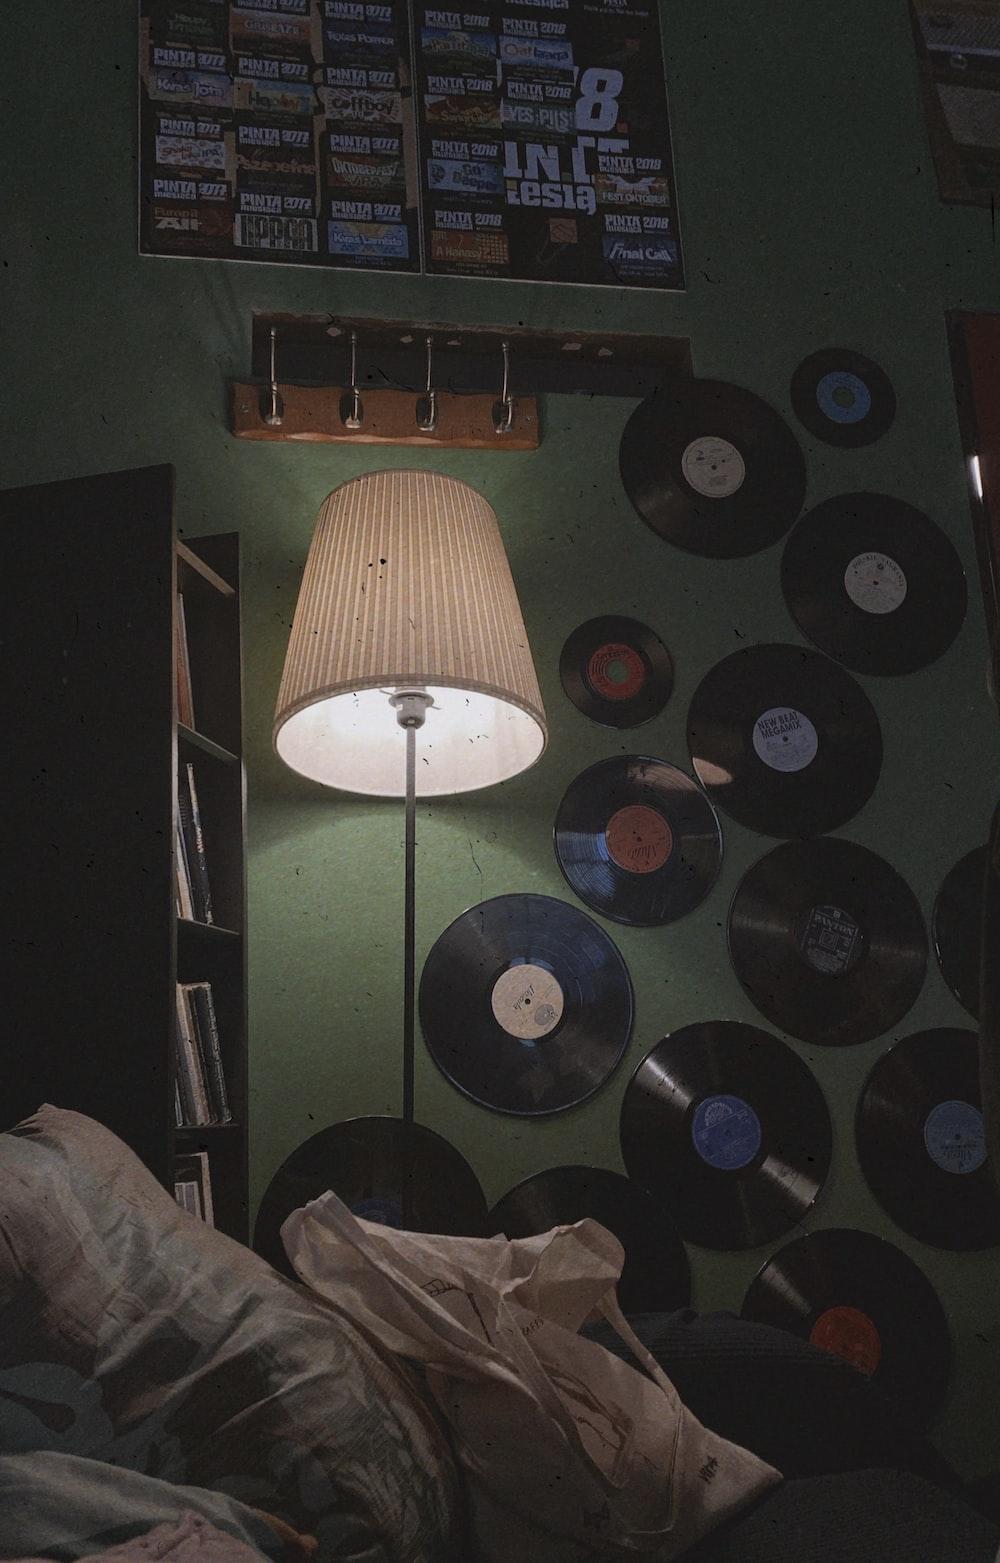 black vinyl albums on a green wall